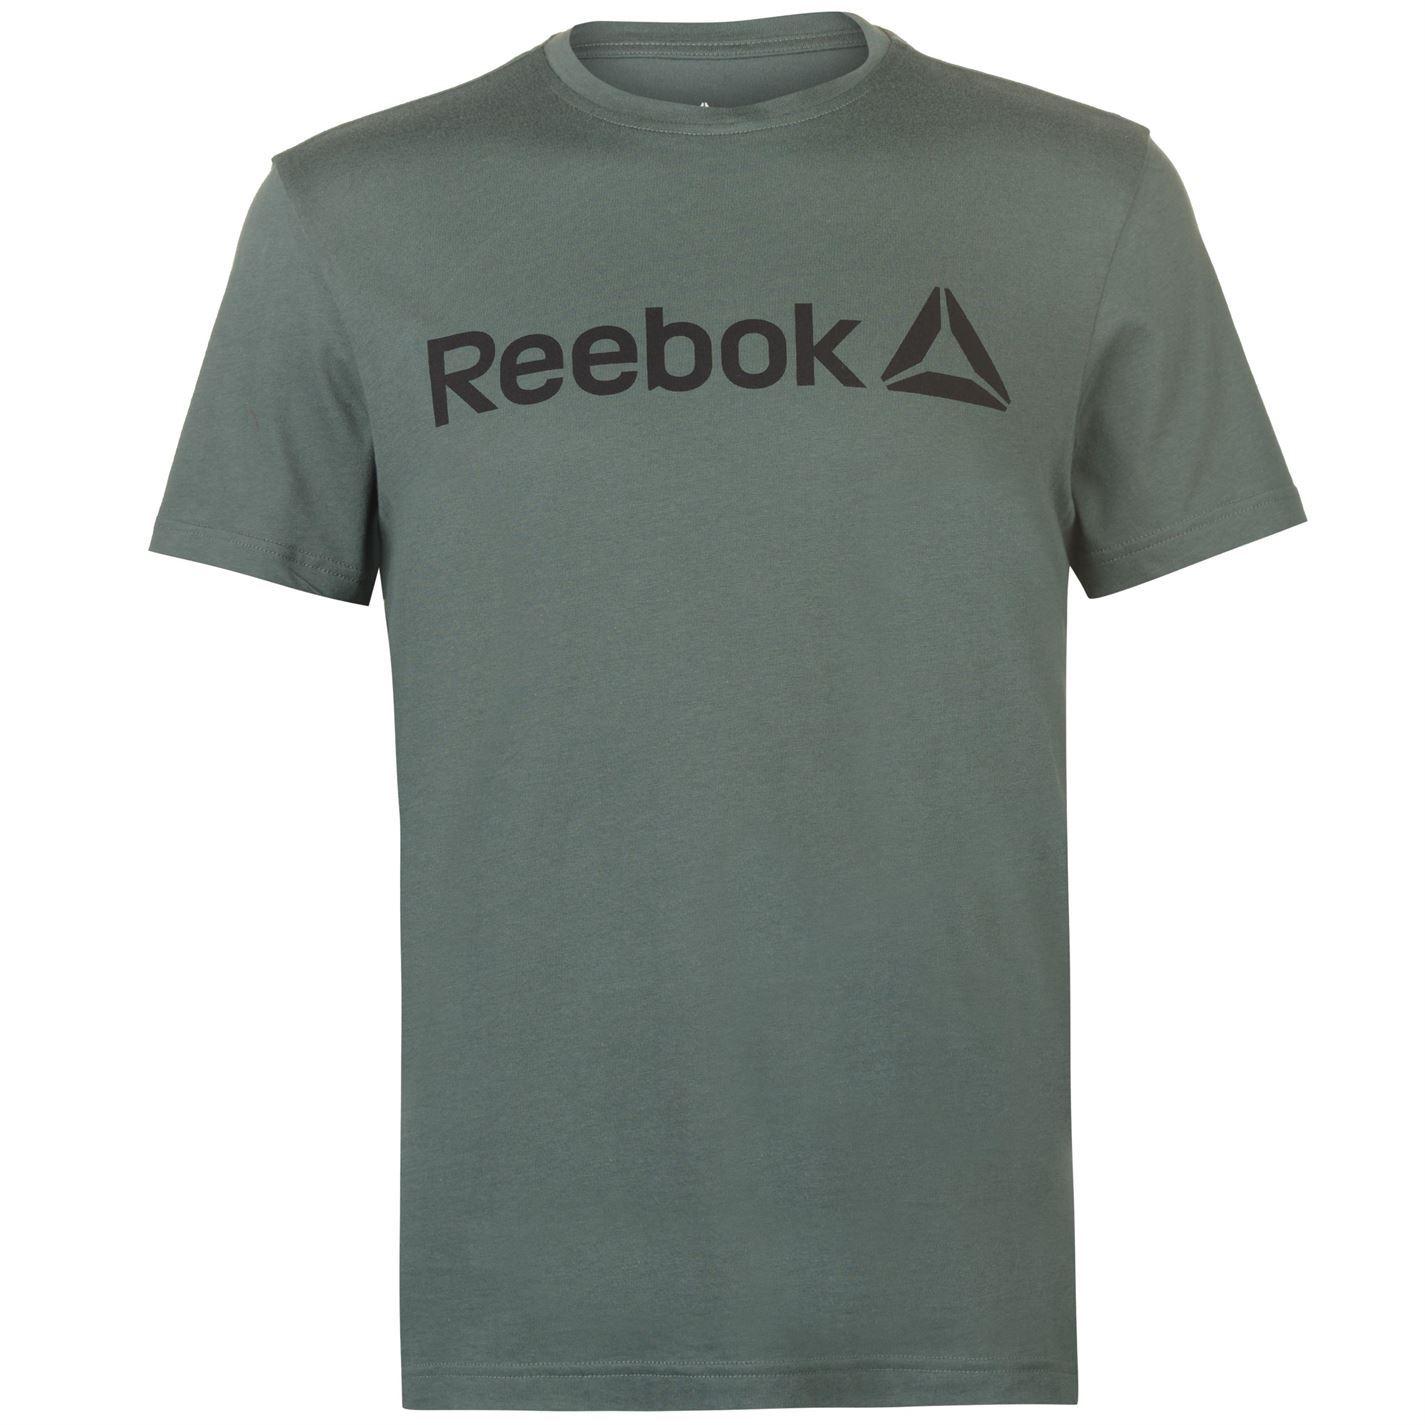 Reebok-Delta-Logo-T-Shirt-Mens-Tee-Shirt-Top thumbnail 20